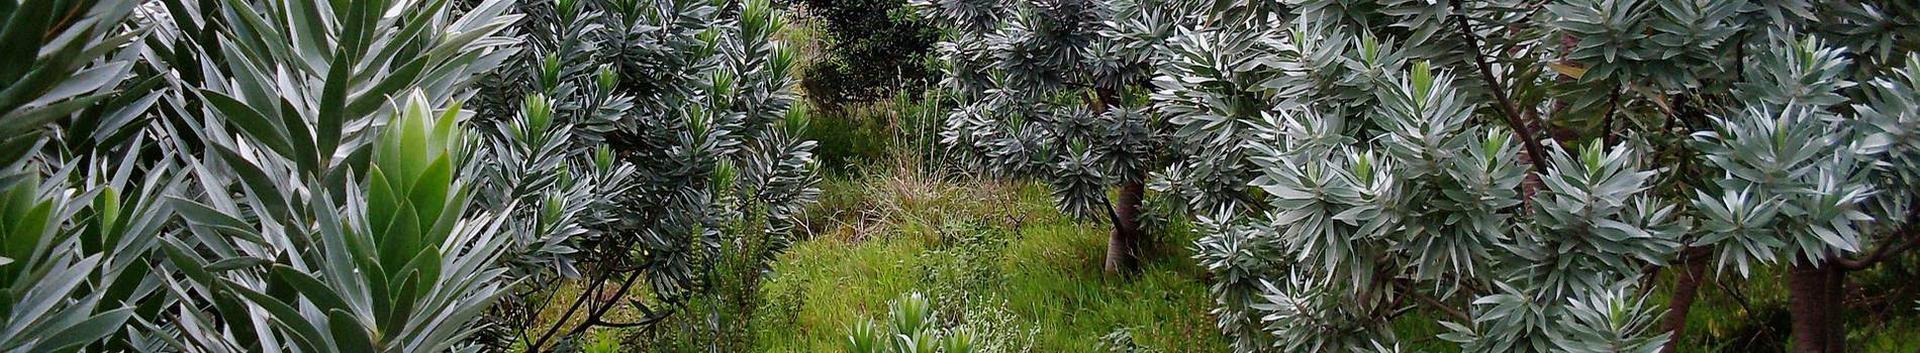 01291_muude-taimede-kasvatus_52476519_xl.jpg